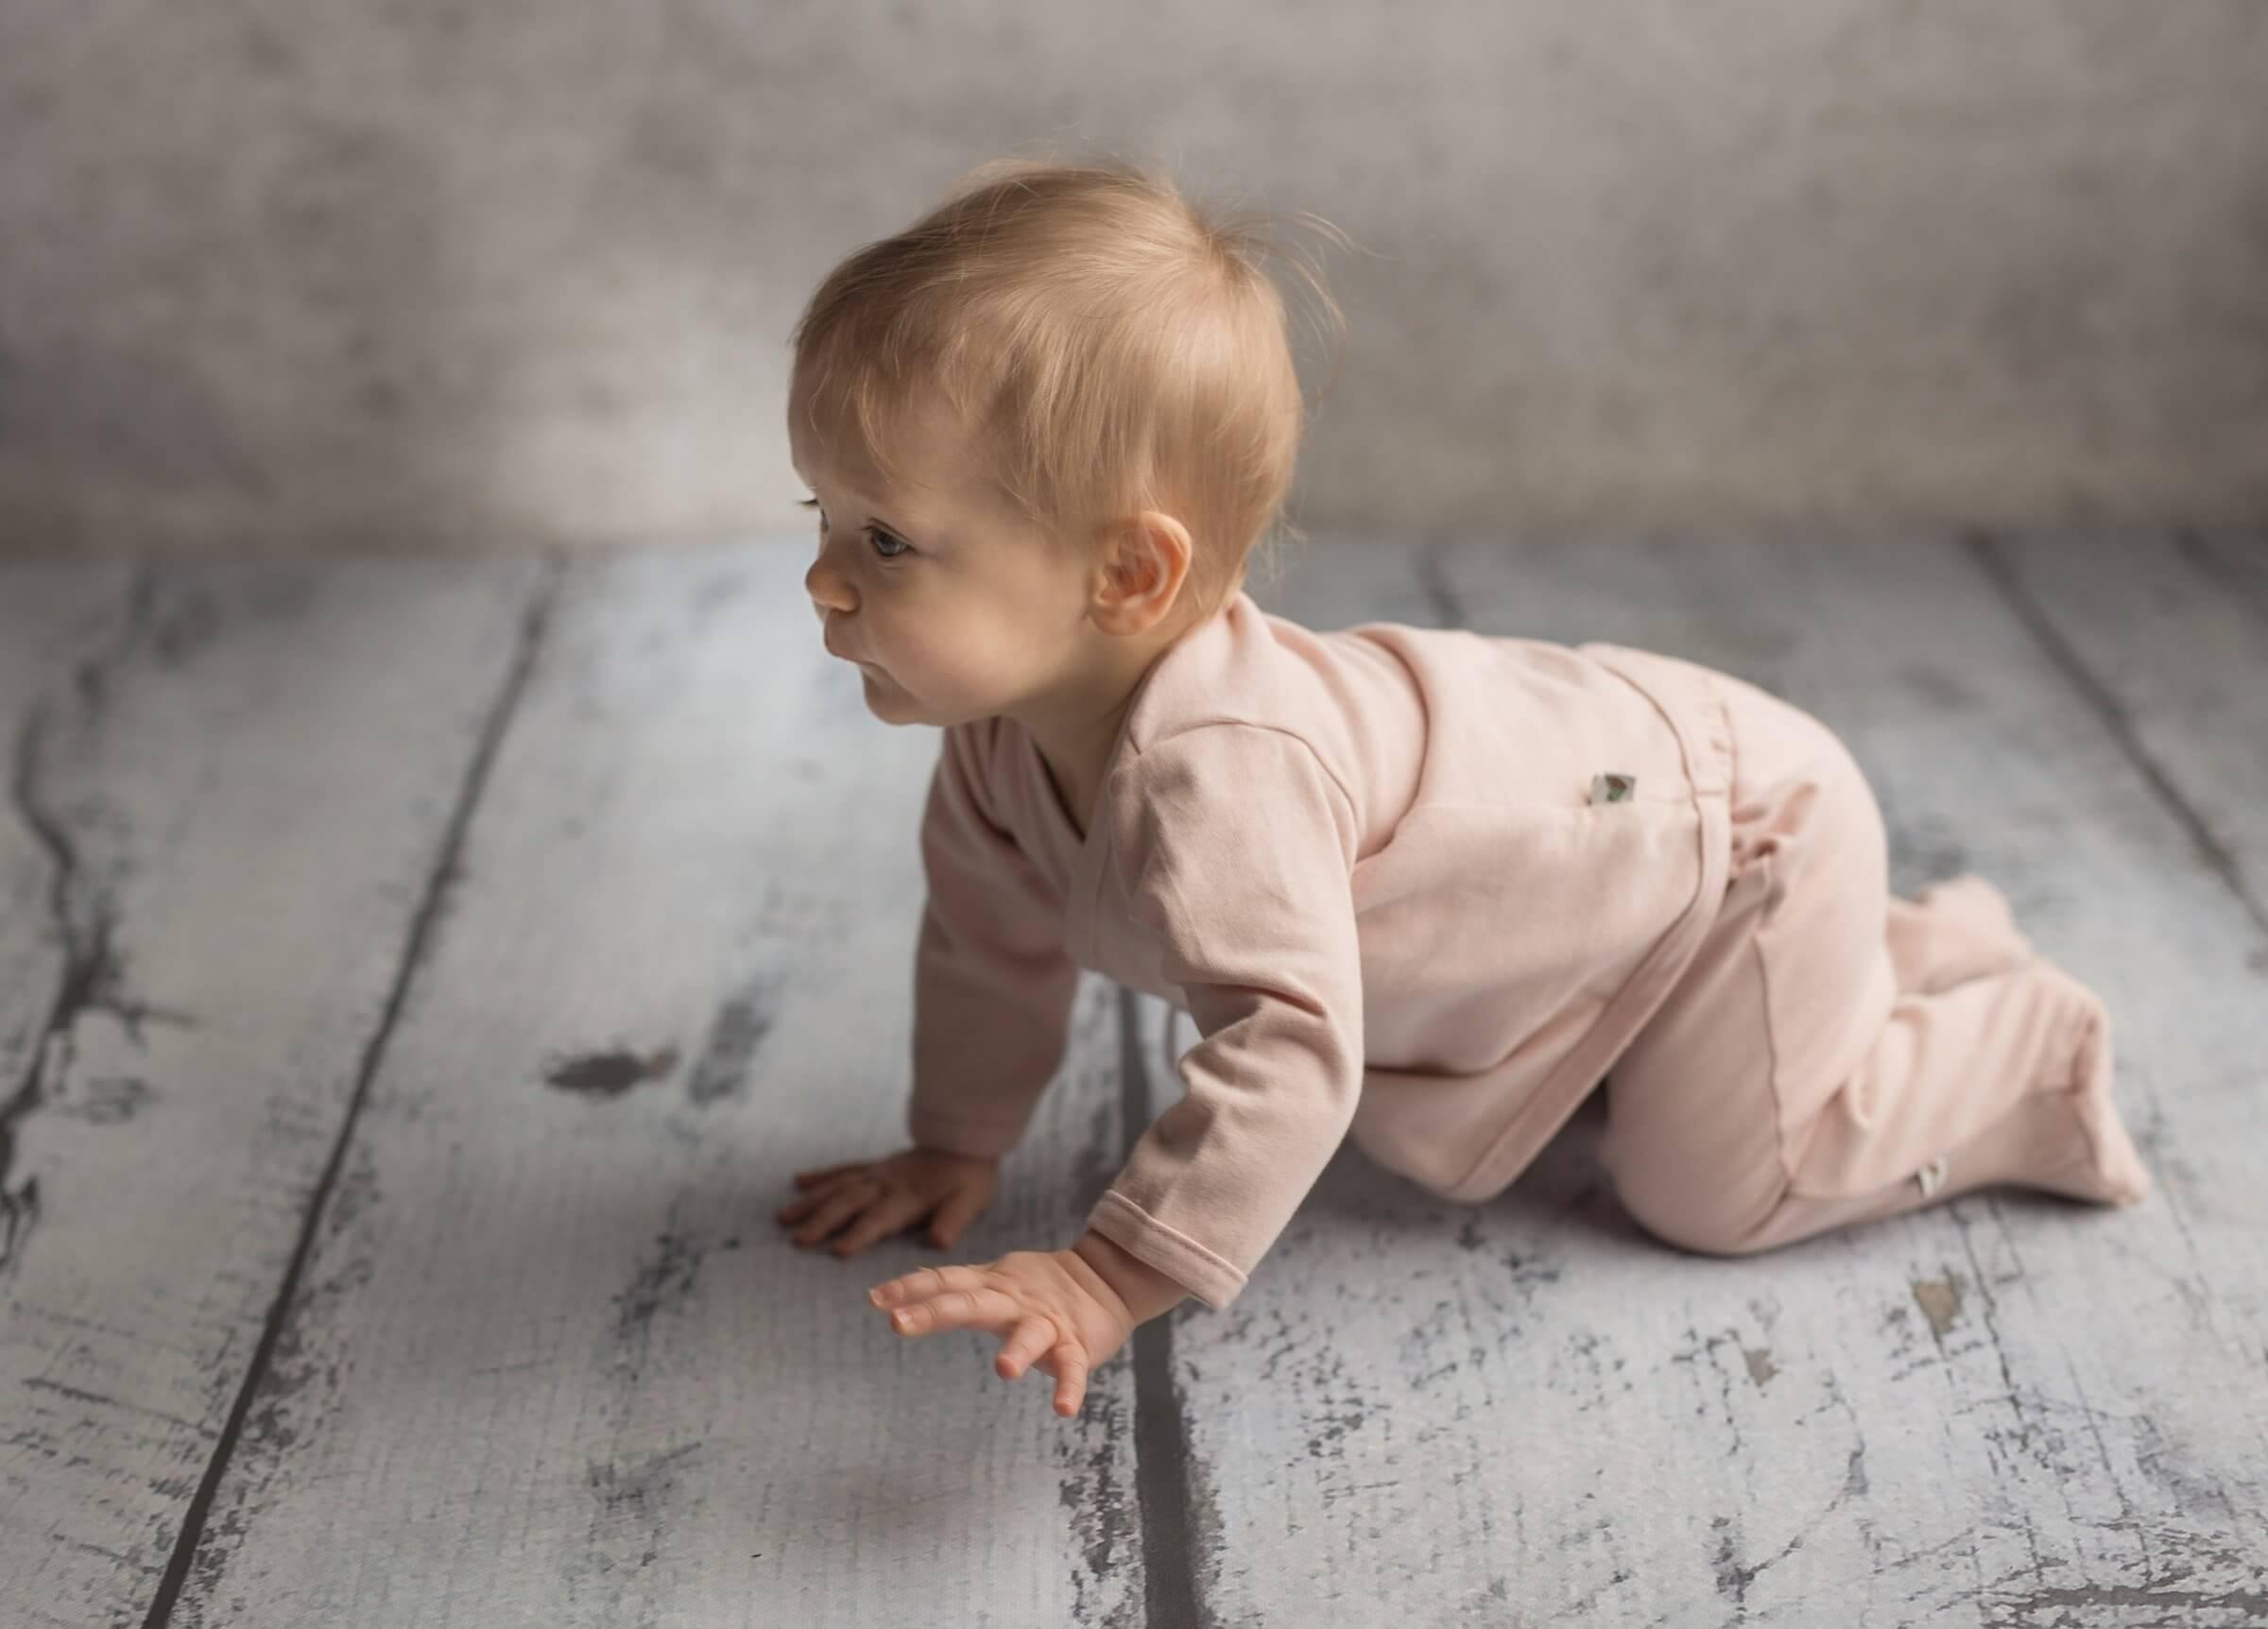 Which bib for a newborn baby should I choose?